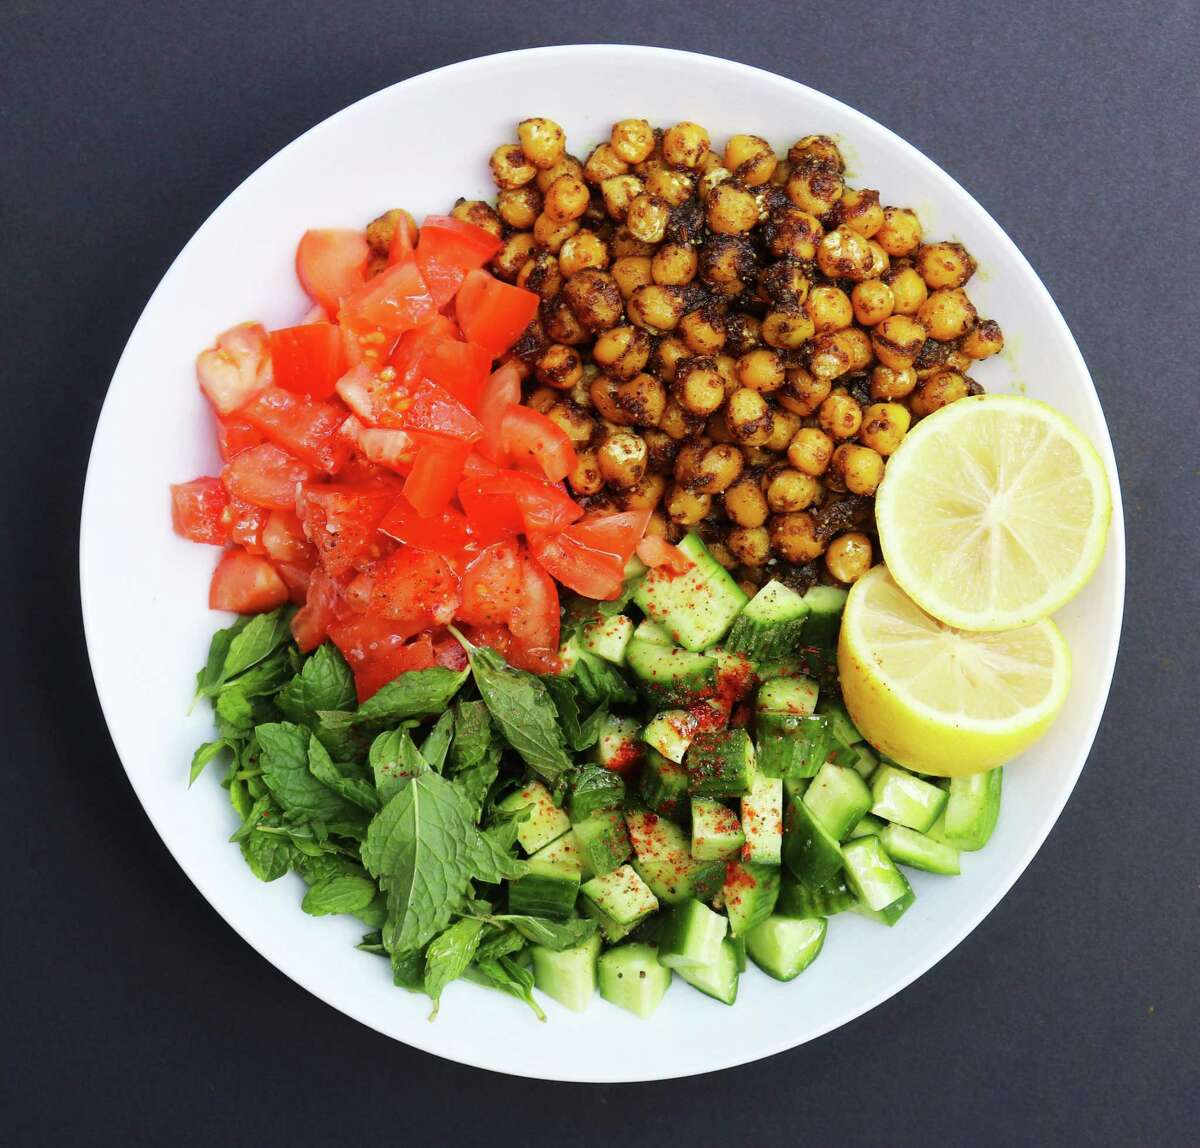 Pan-Roasted Chickpea Salad from chef Anita Jaisinghani